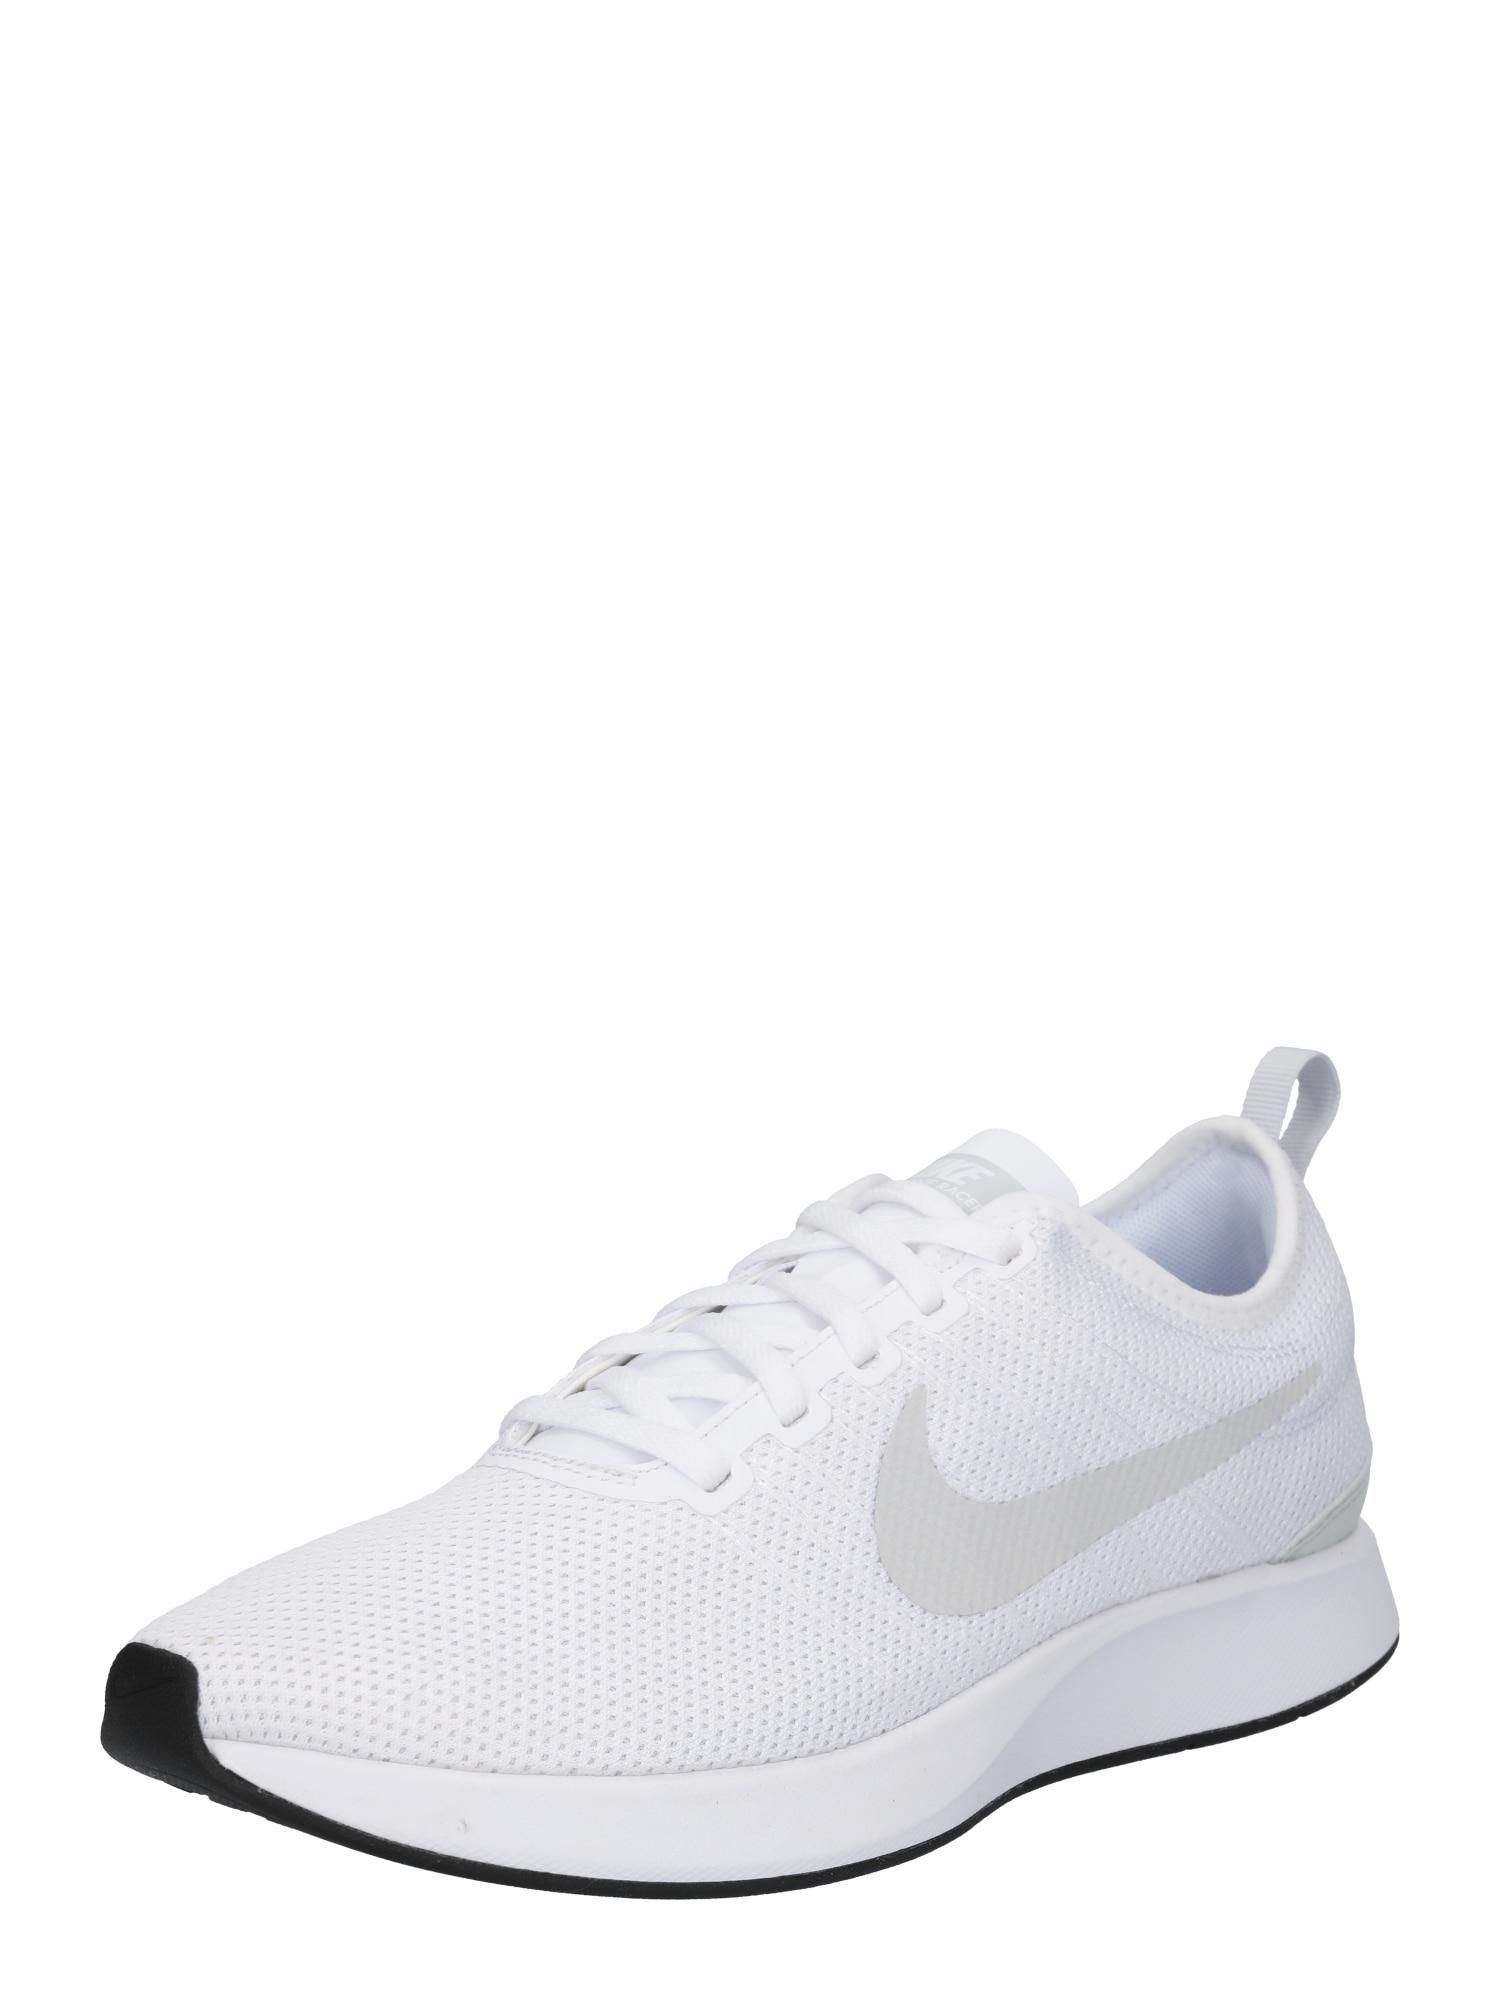 Tenisky DUALTONE RACER bílá Nike Sportswear